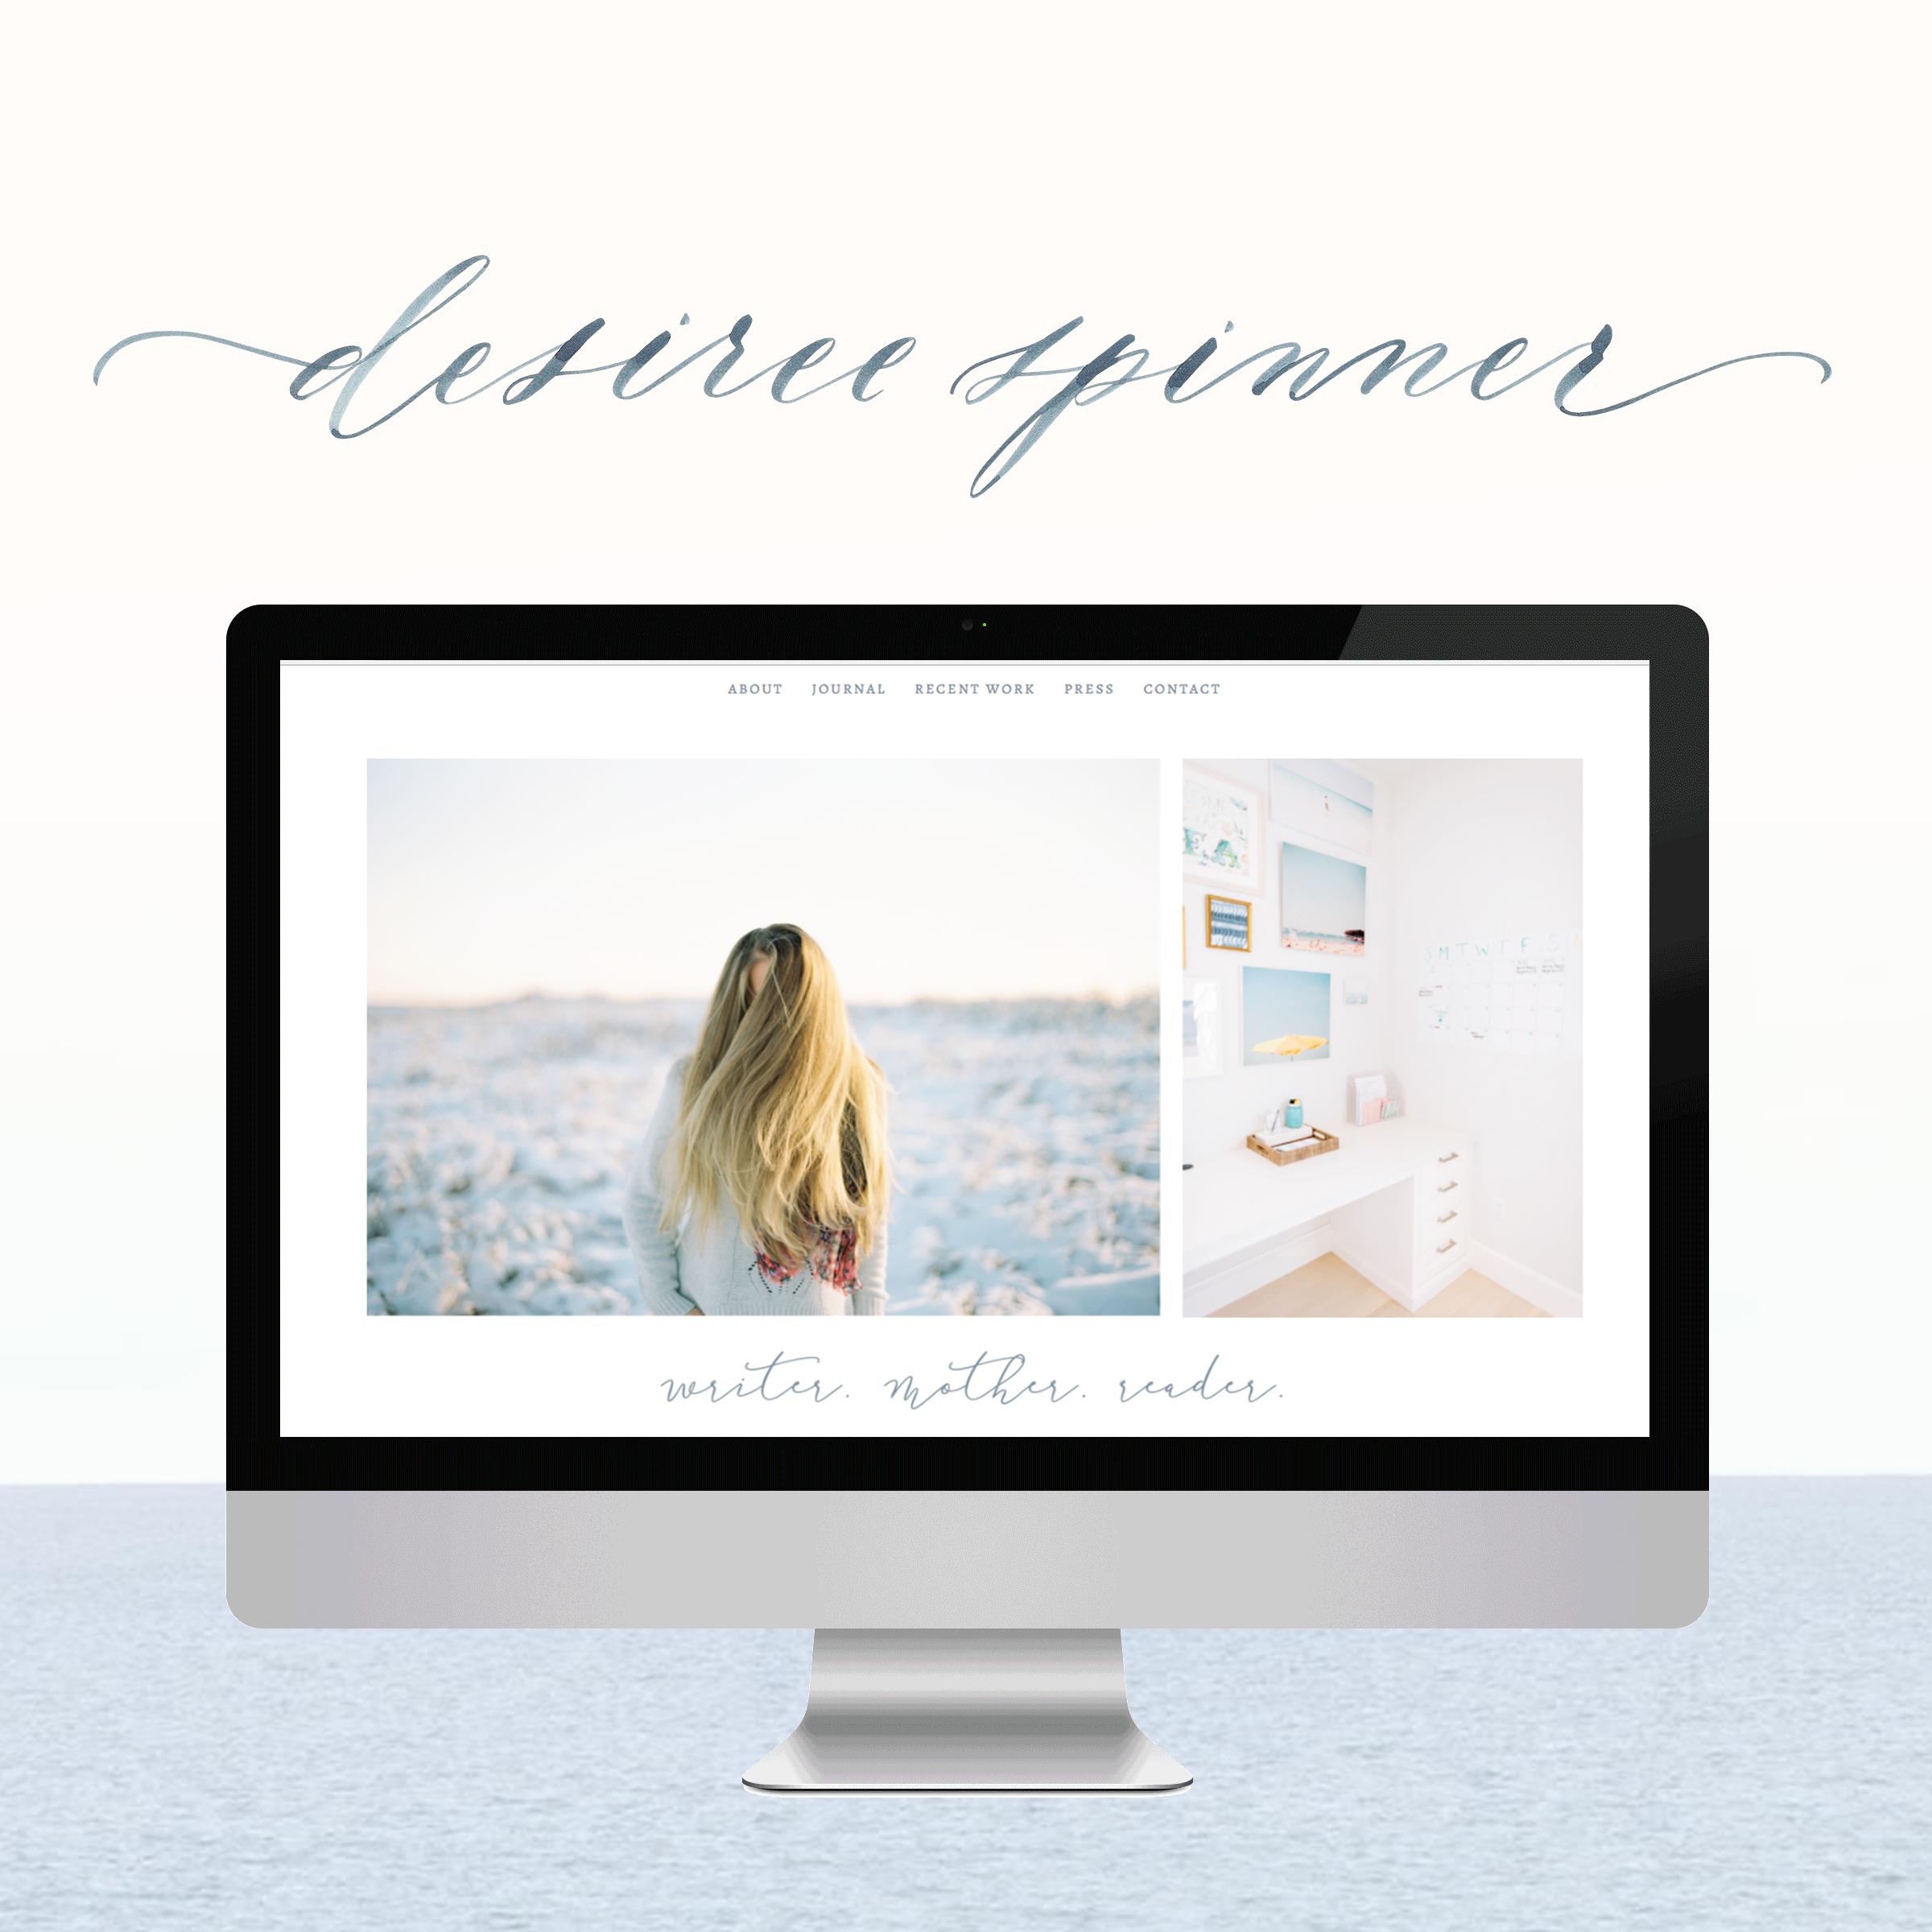 blue-ocean-calm-web-design.png